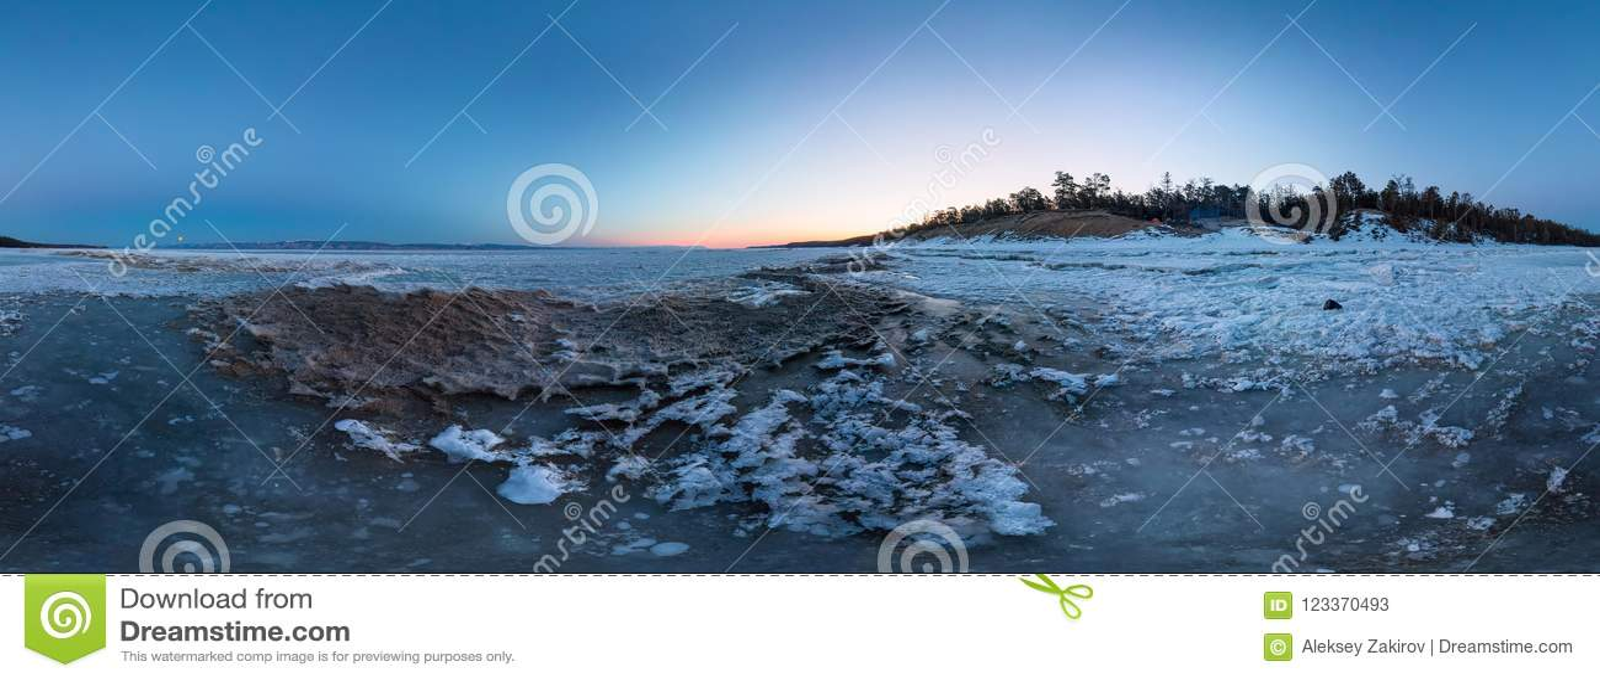 Gry på en sandig strand på ön av Olkhon cylindrisk 360 grad vrpanorama